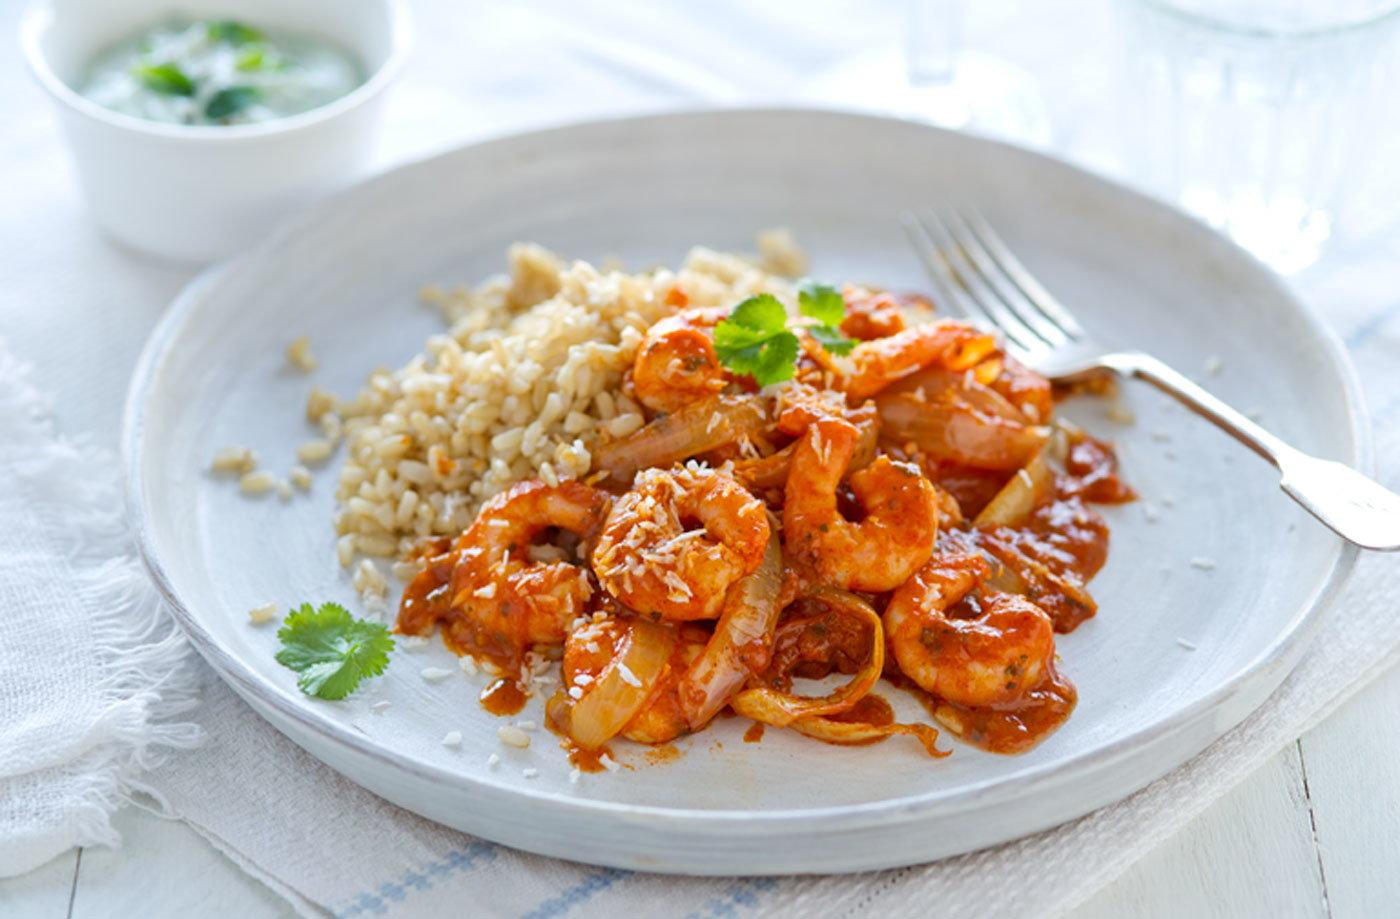 Healthy Food Recipes With Prawns